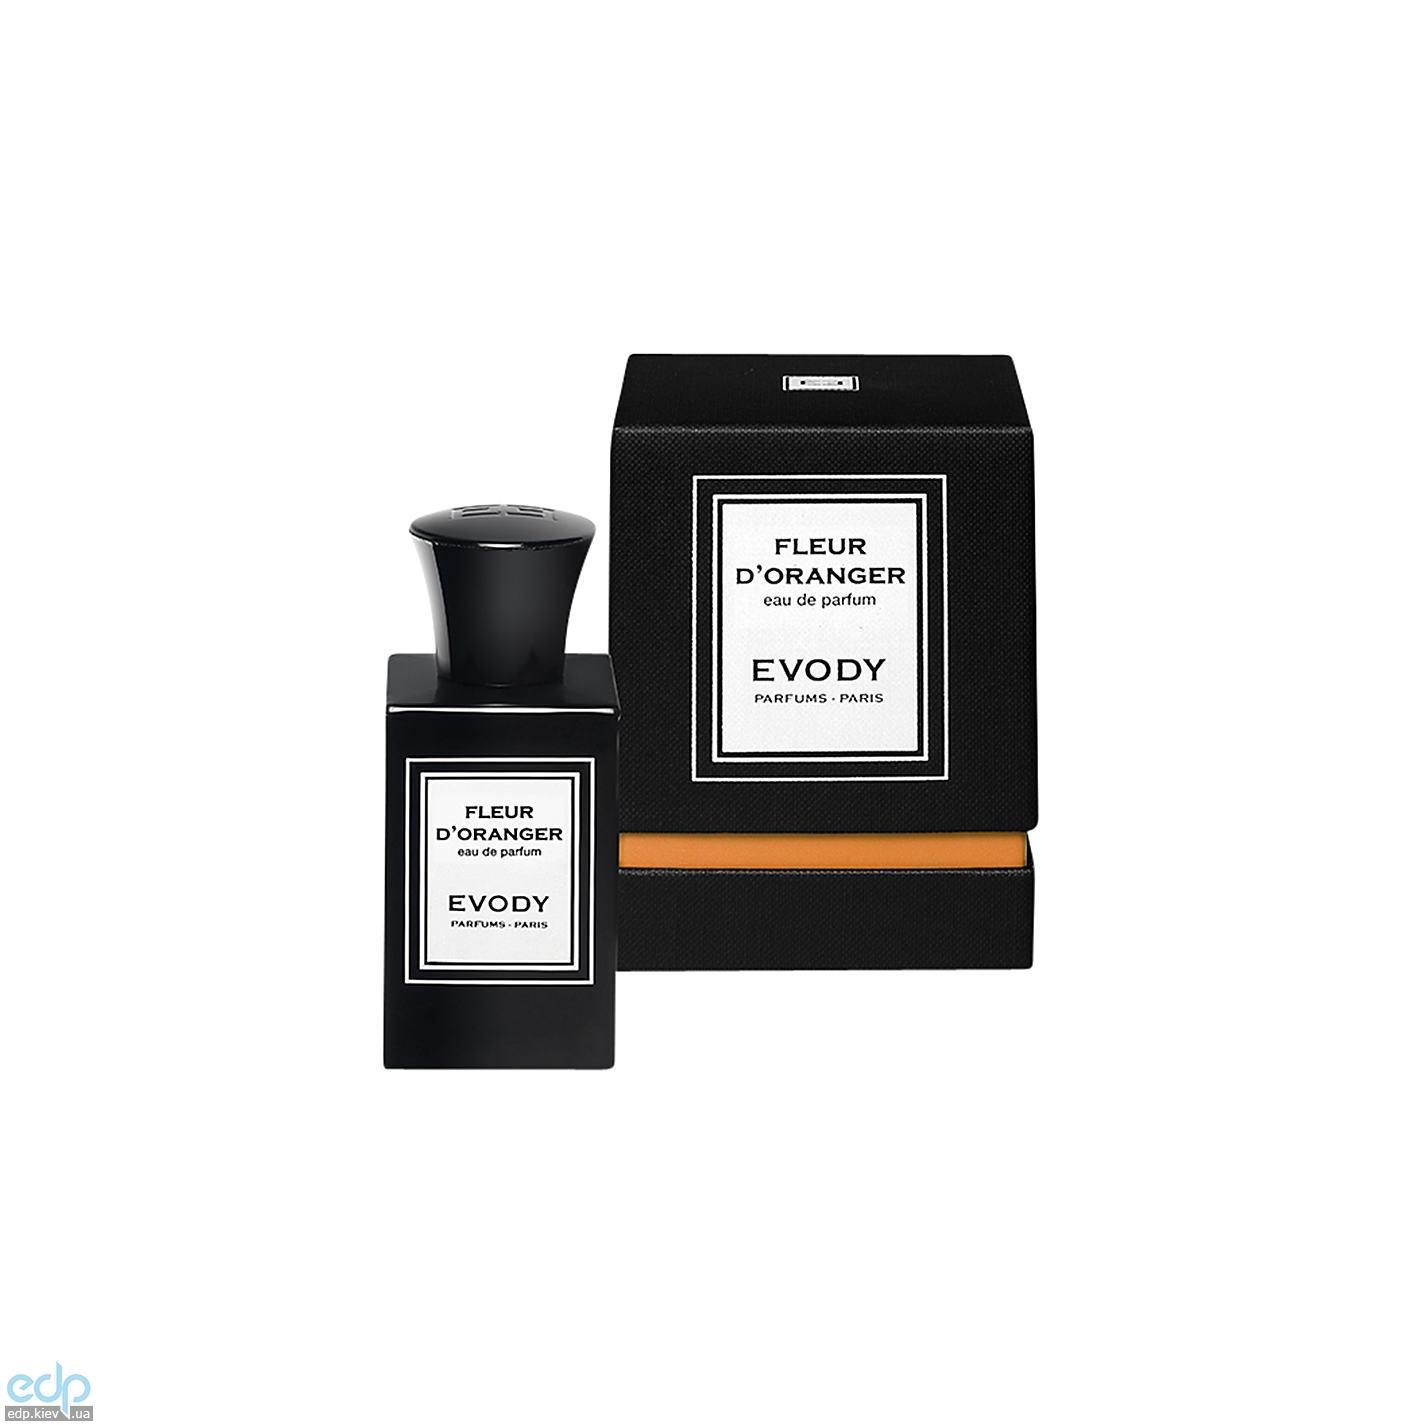 Evody Parfums Fleur d Oranger